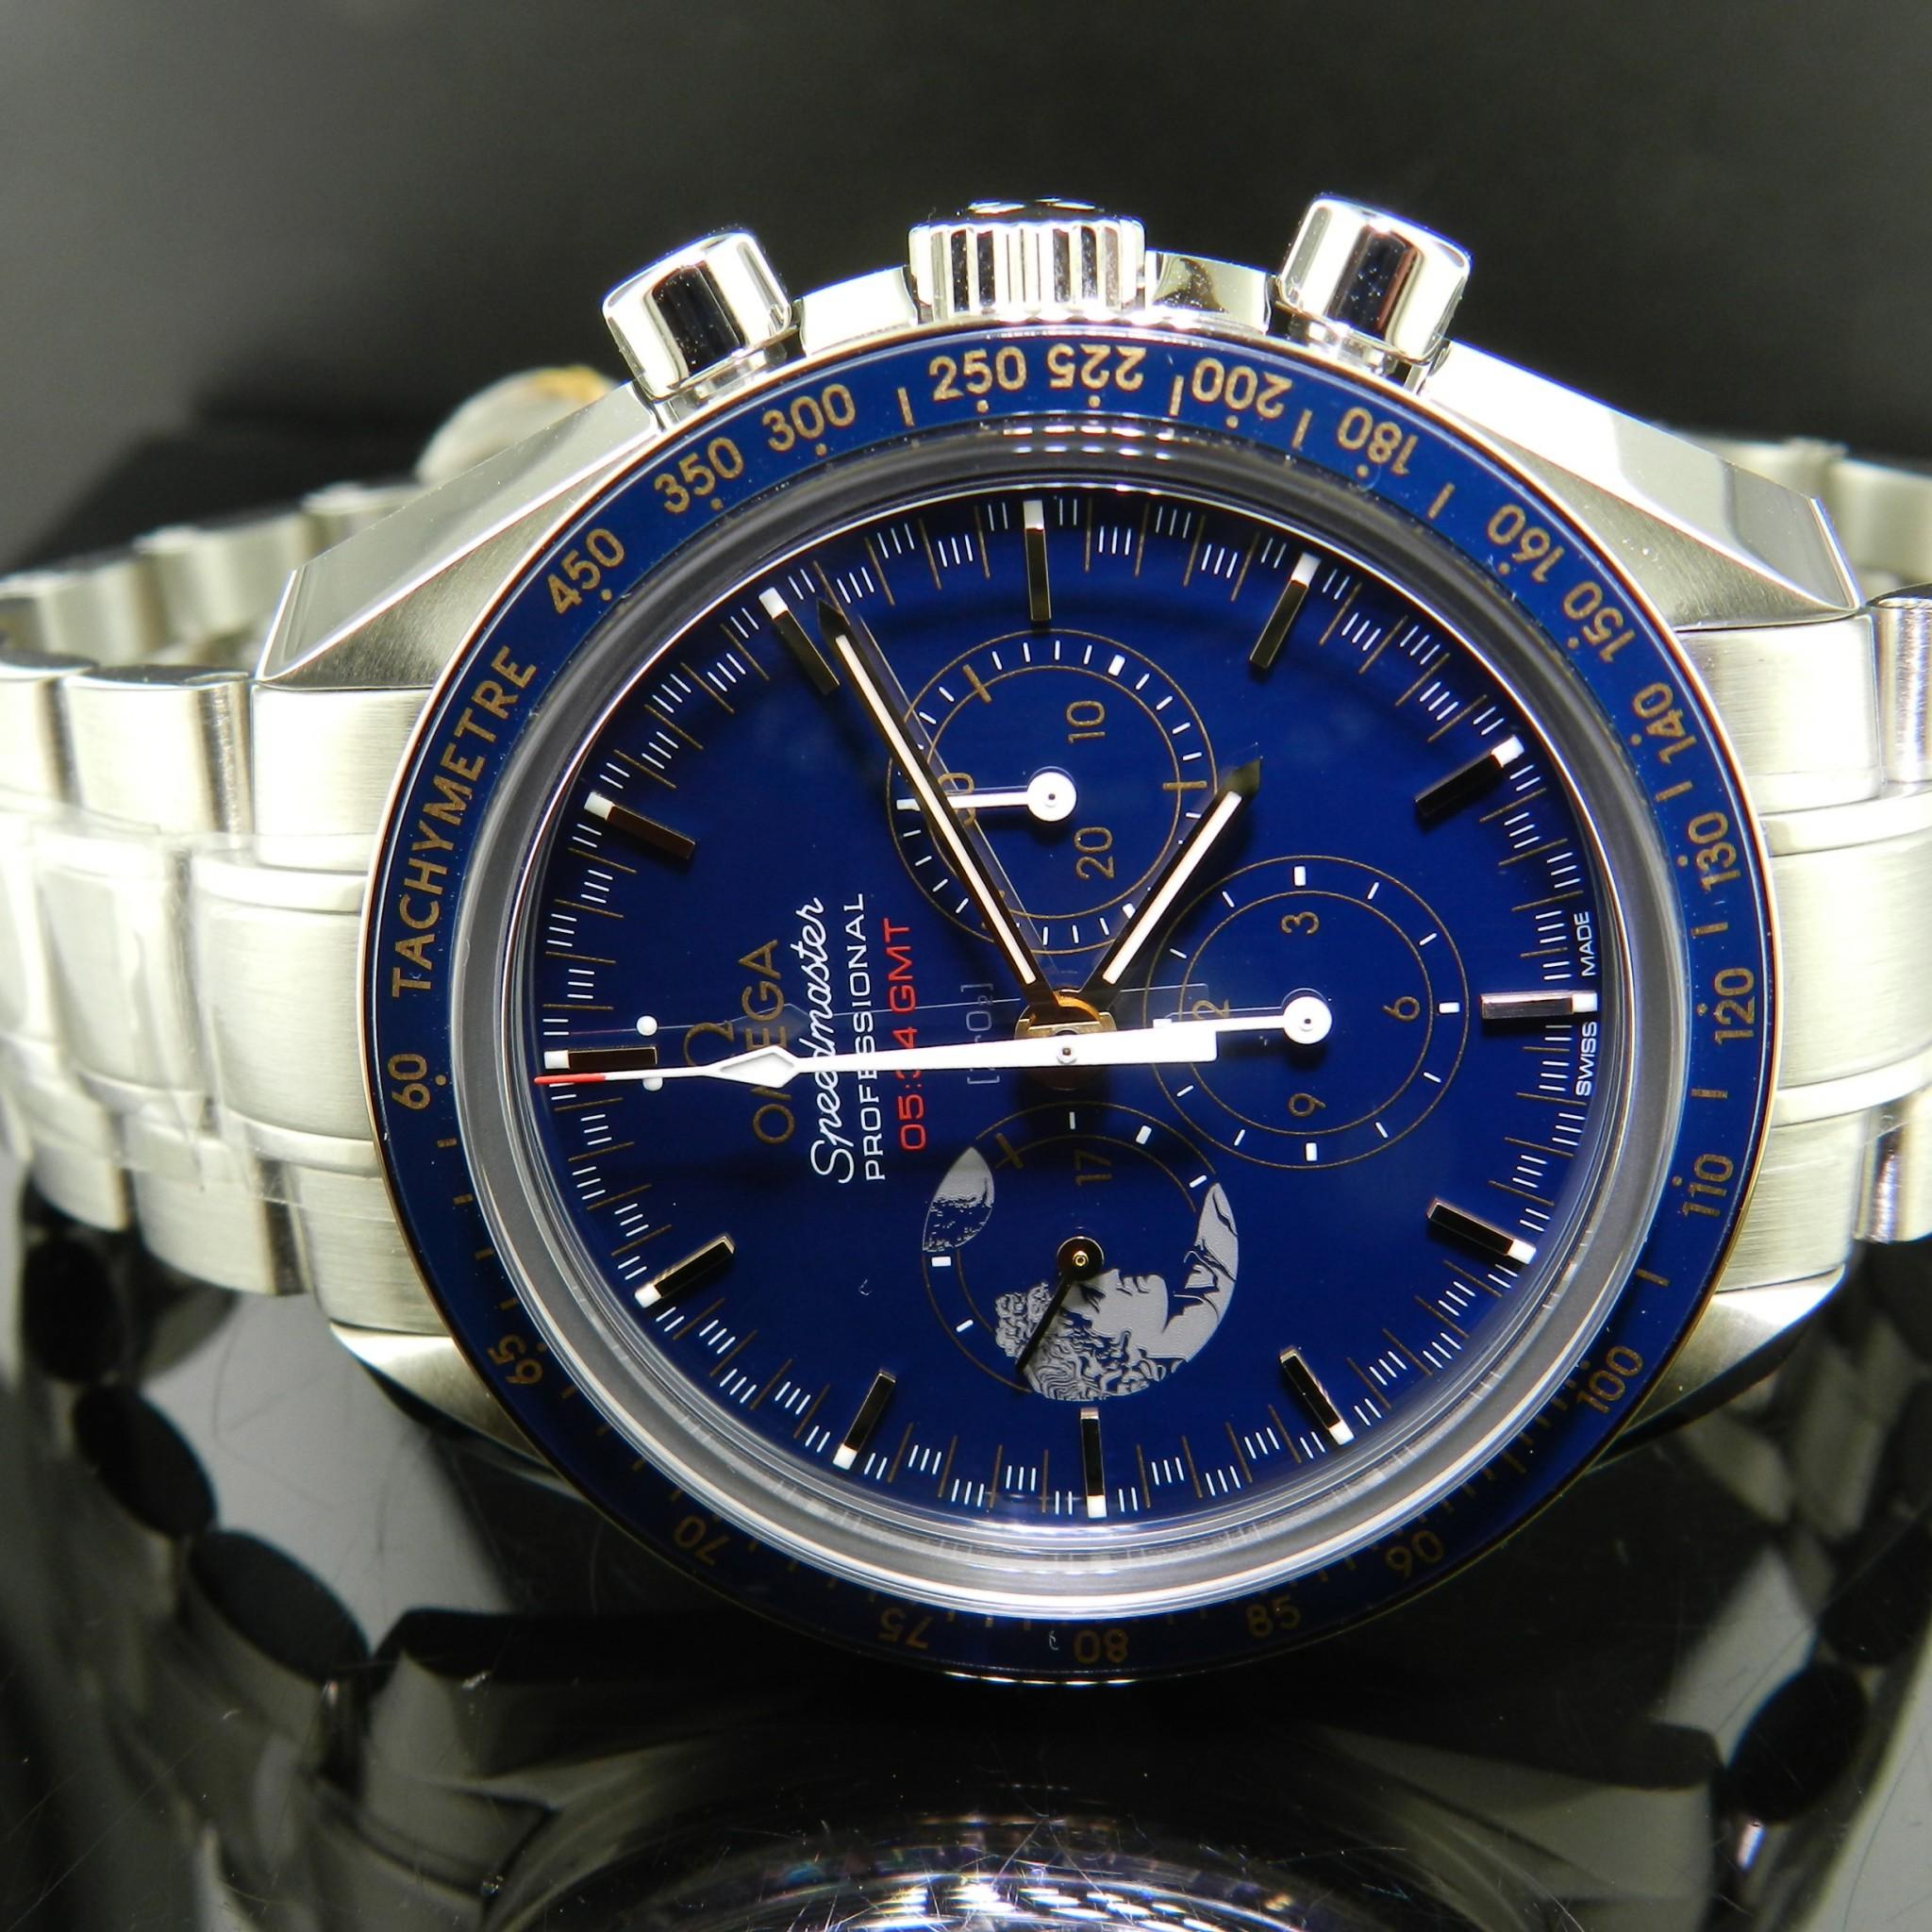 Omega Speedmaster Professional Moonwatch Apollo XVII L.E | Riccione